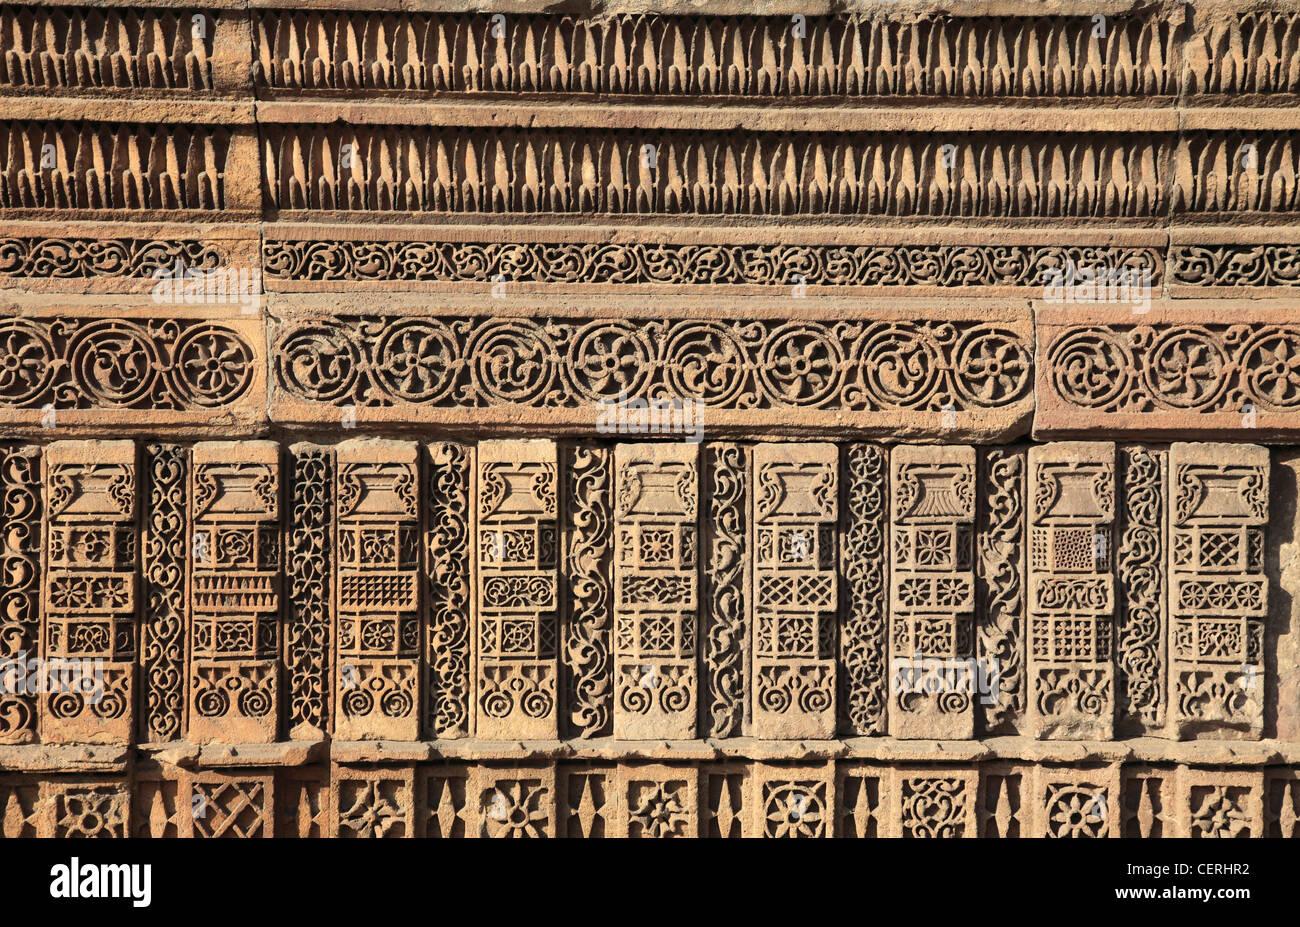 India, Gujarat, Ahmedabad, Rani Sipri's Mosque, Masjid-e-Nagira, stone carving, detail, - Stock Image